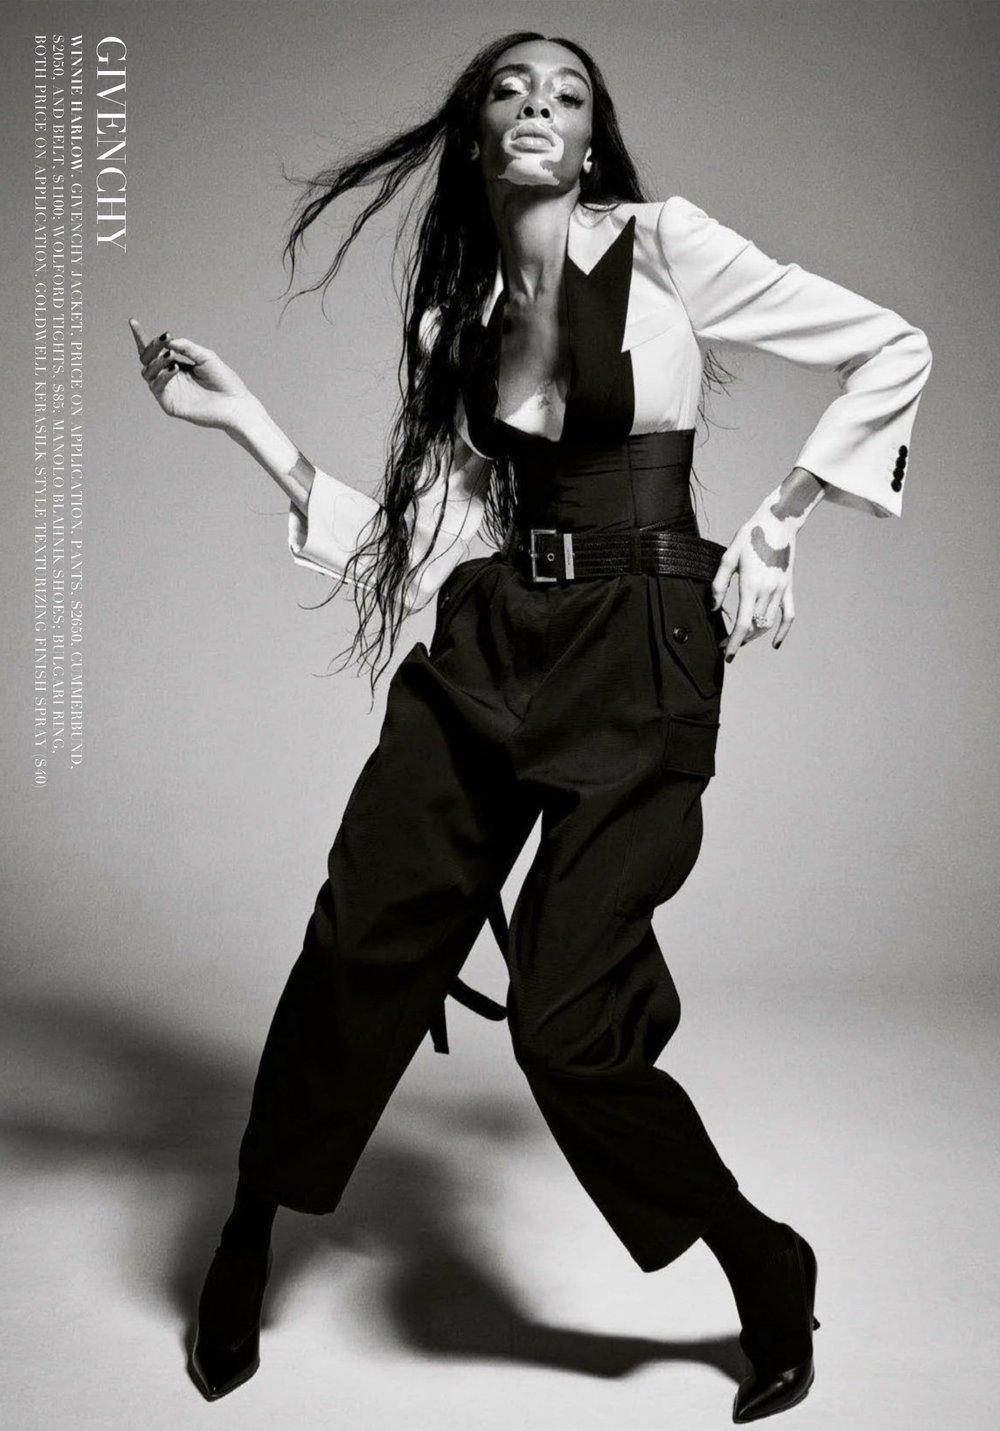 Mario Sorrenti for Harper's Bazaar Australia March 2019 (4).jpg